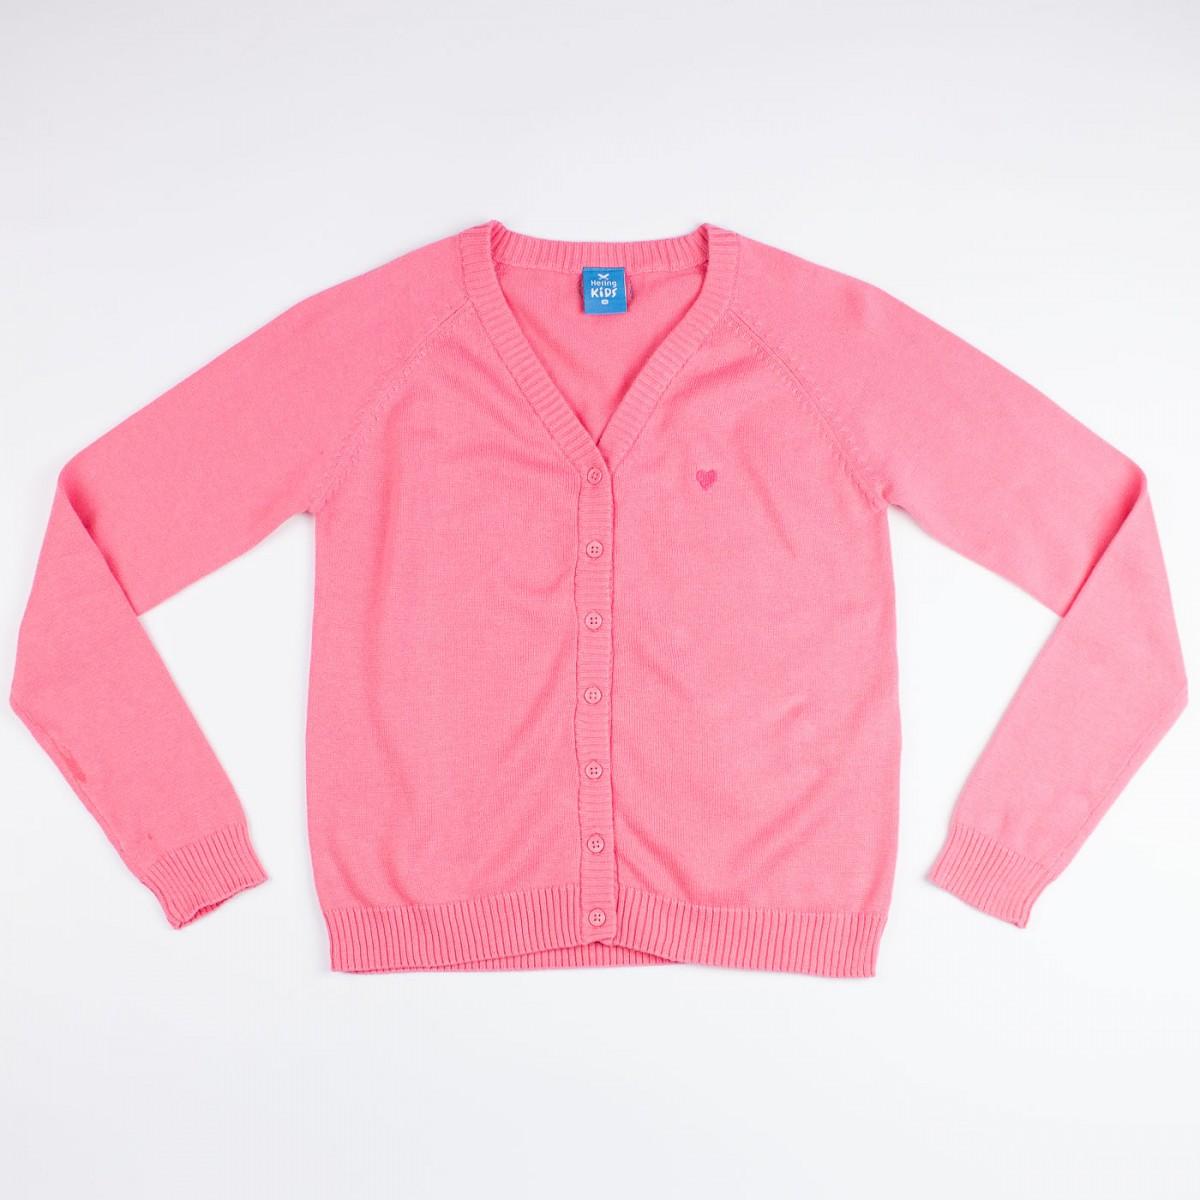 Bizz Store - Casaco Infantil Feminino Hering Kids Cardigan c10929e9004